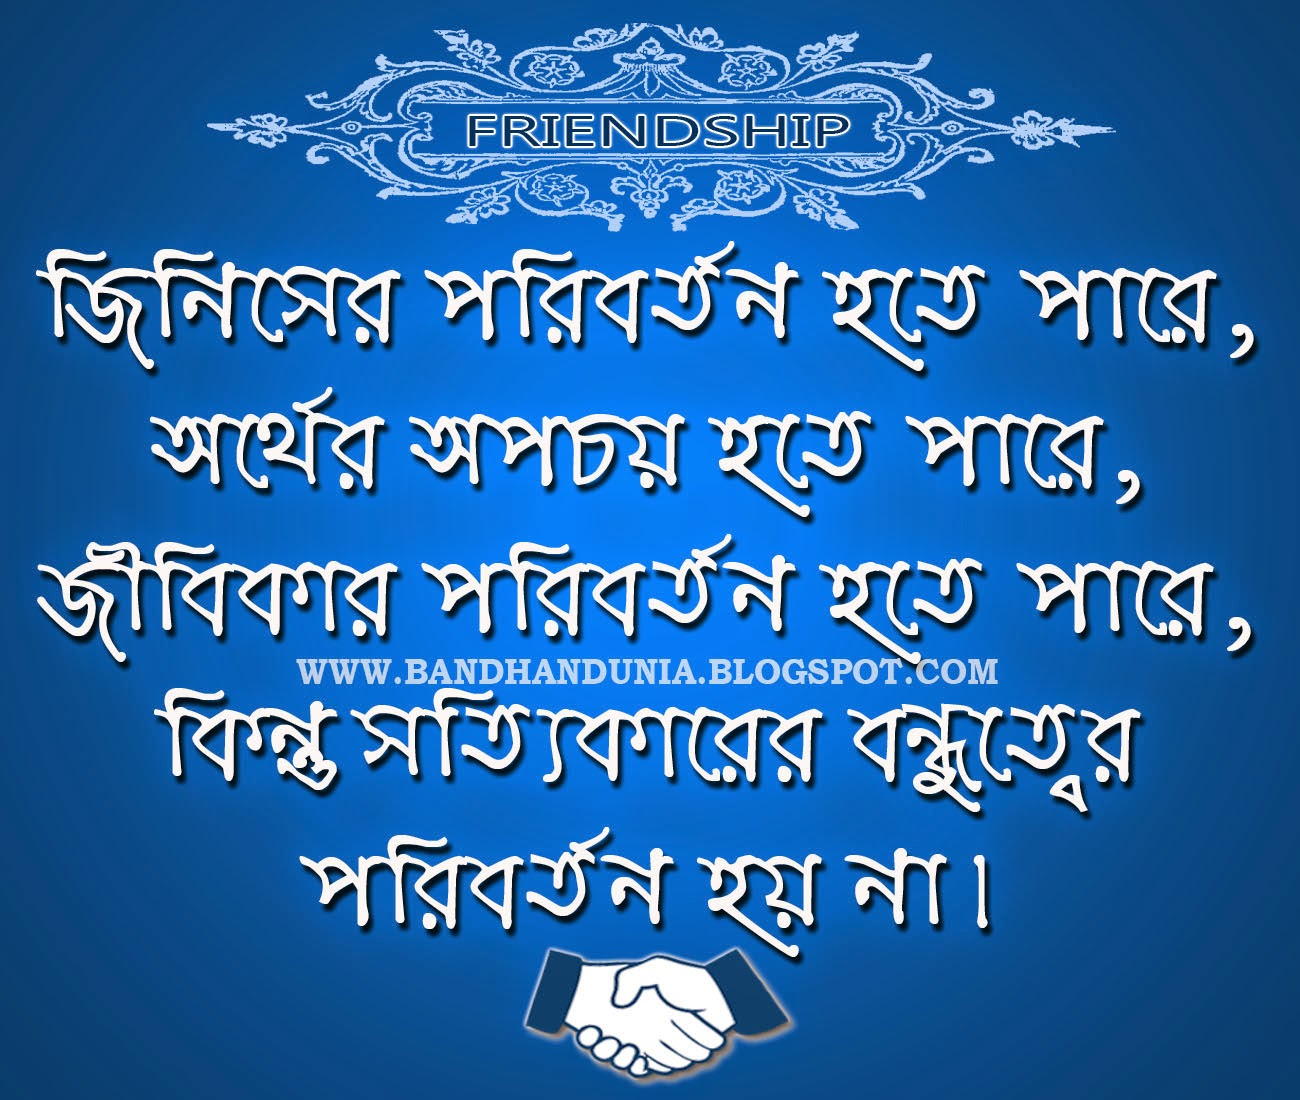 Friendship Quotes In Bangla Font : Bandhan dunia